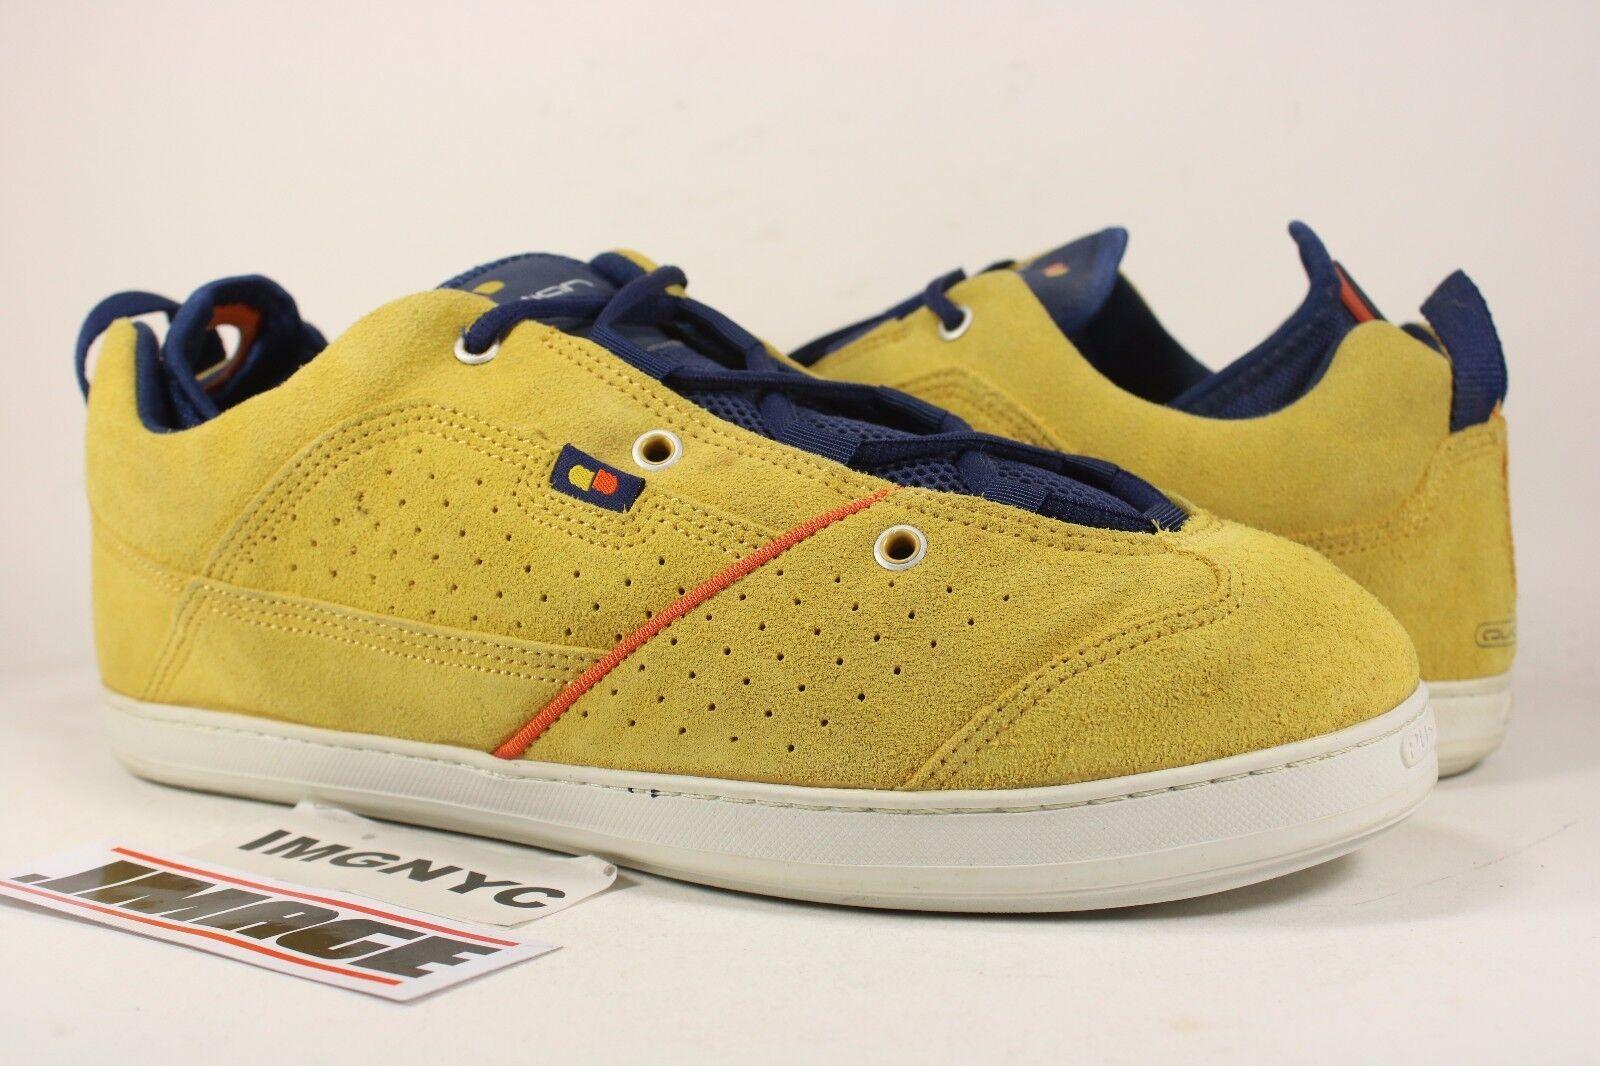 Nike ovidian nuove dimensioni medie giallo arancio 173237 781 sb skate college